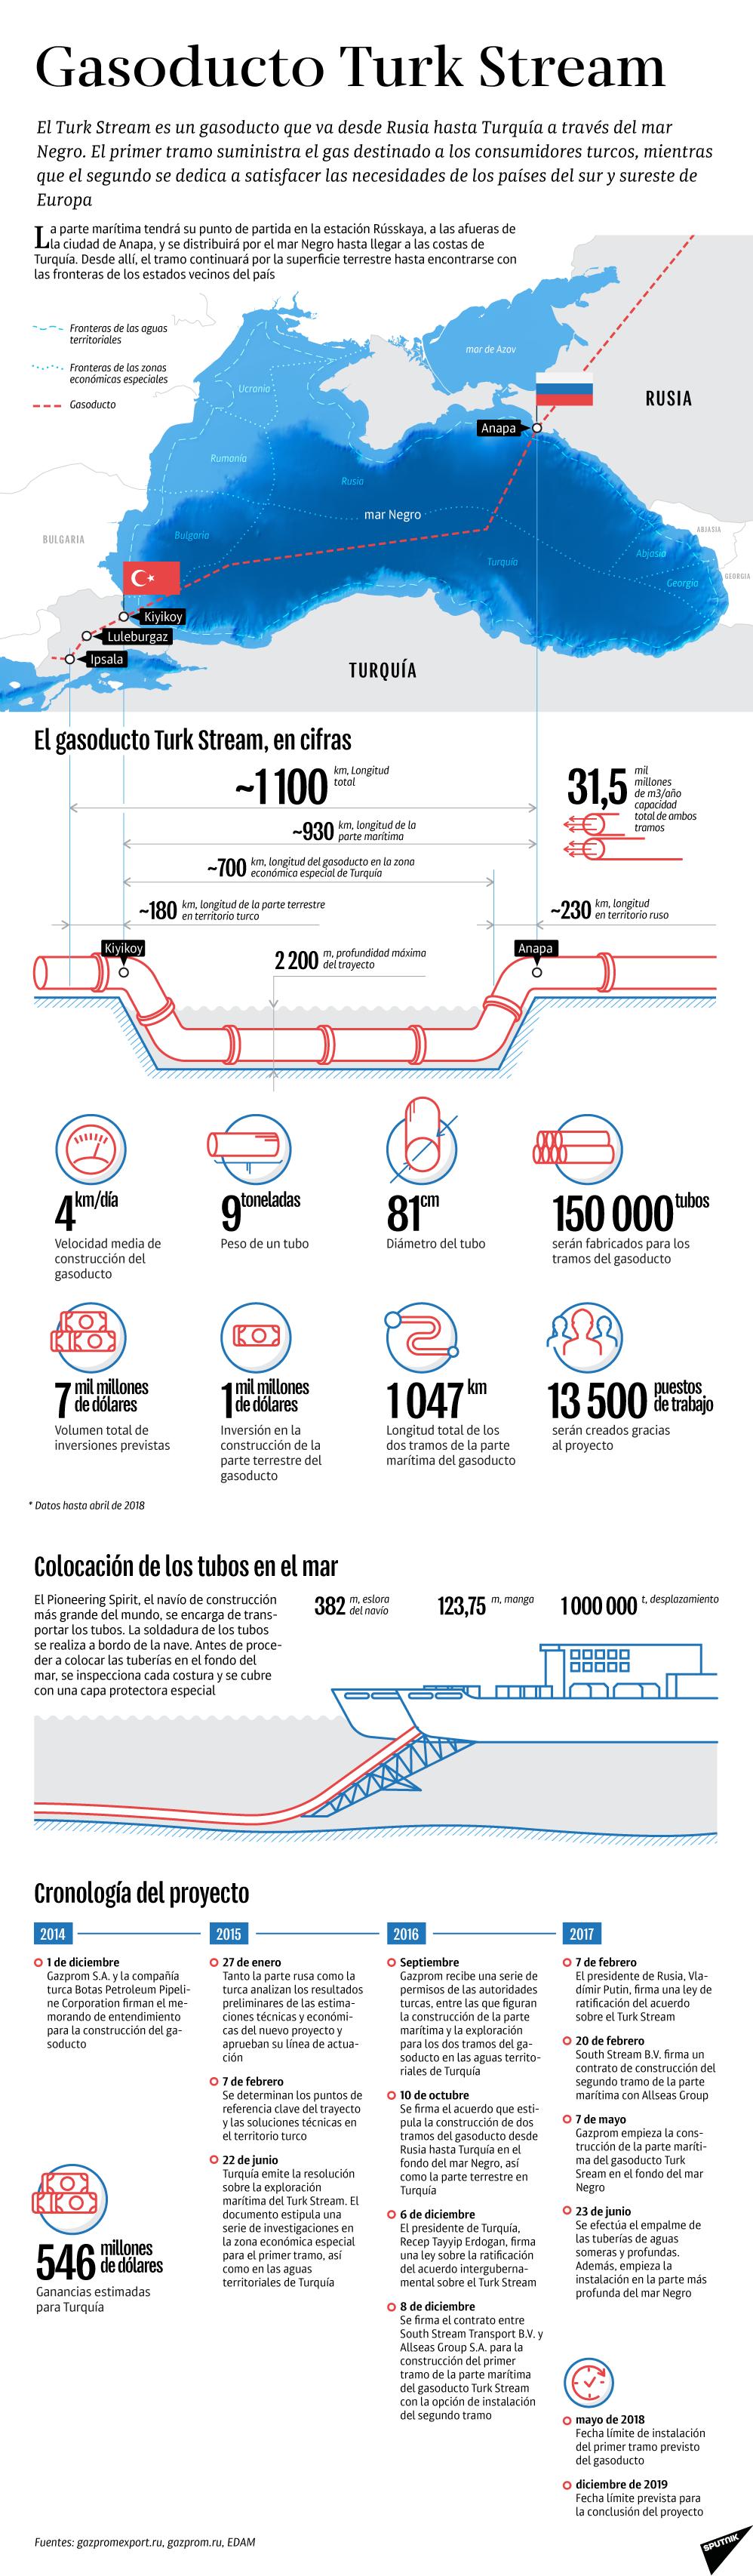 Gasoducto Turk Stream - Sputnik Mundo